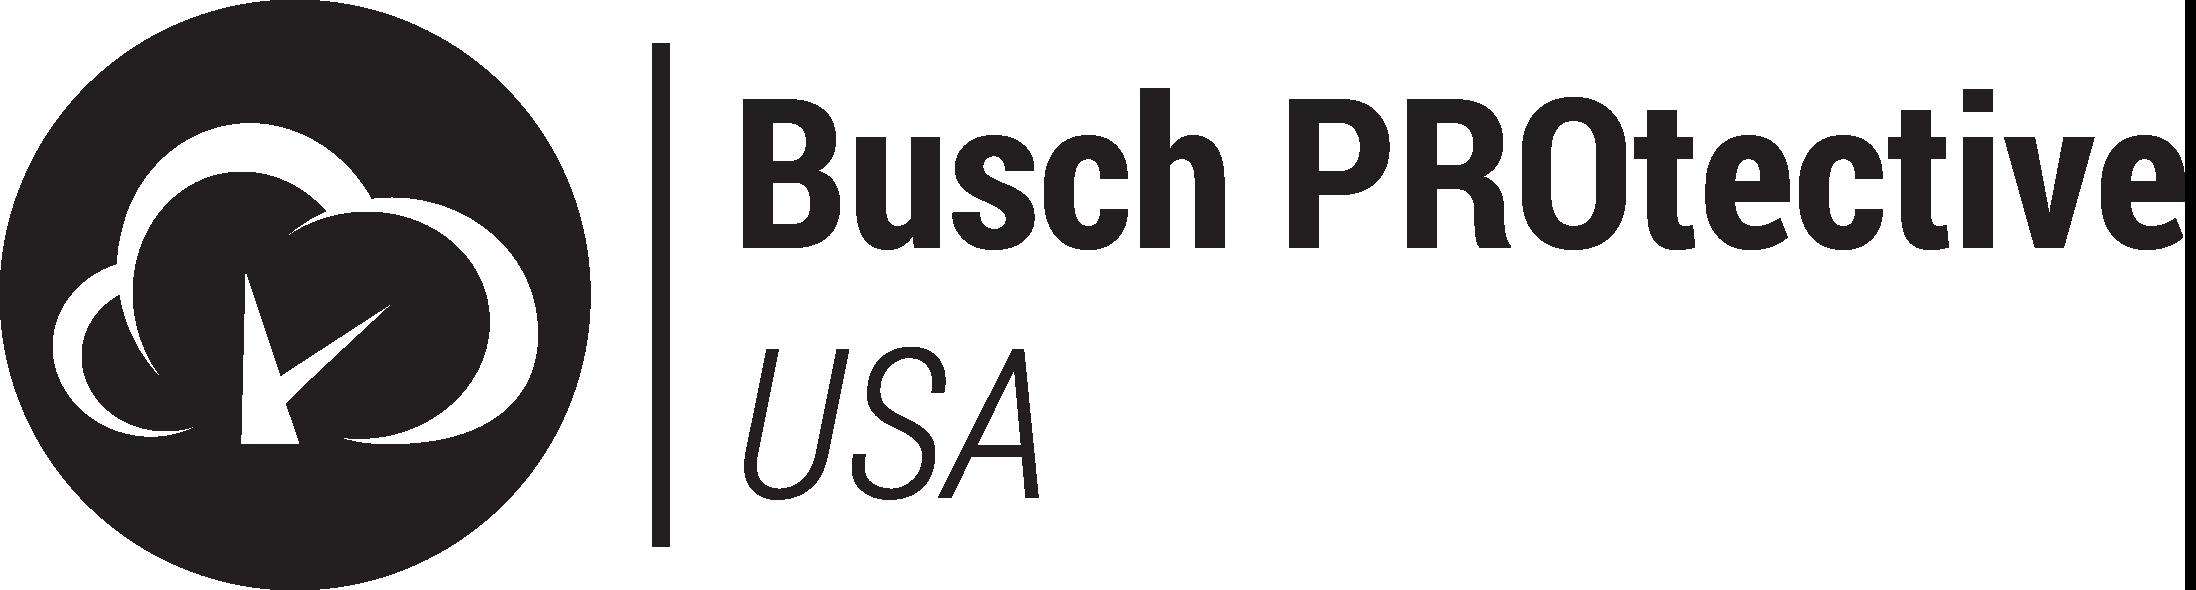 Busch PRO USA_1